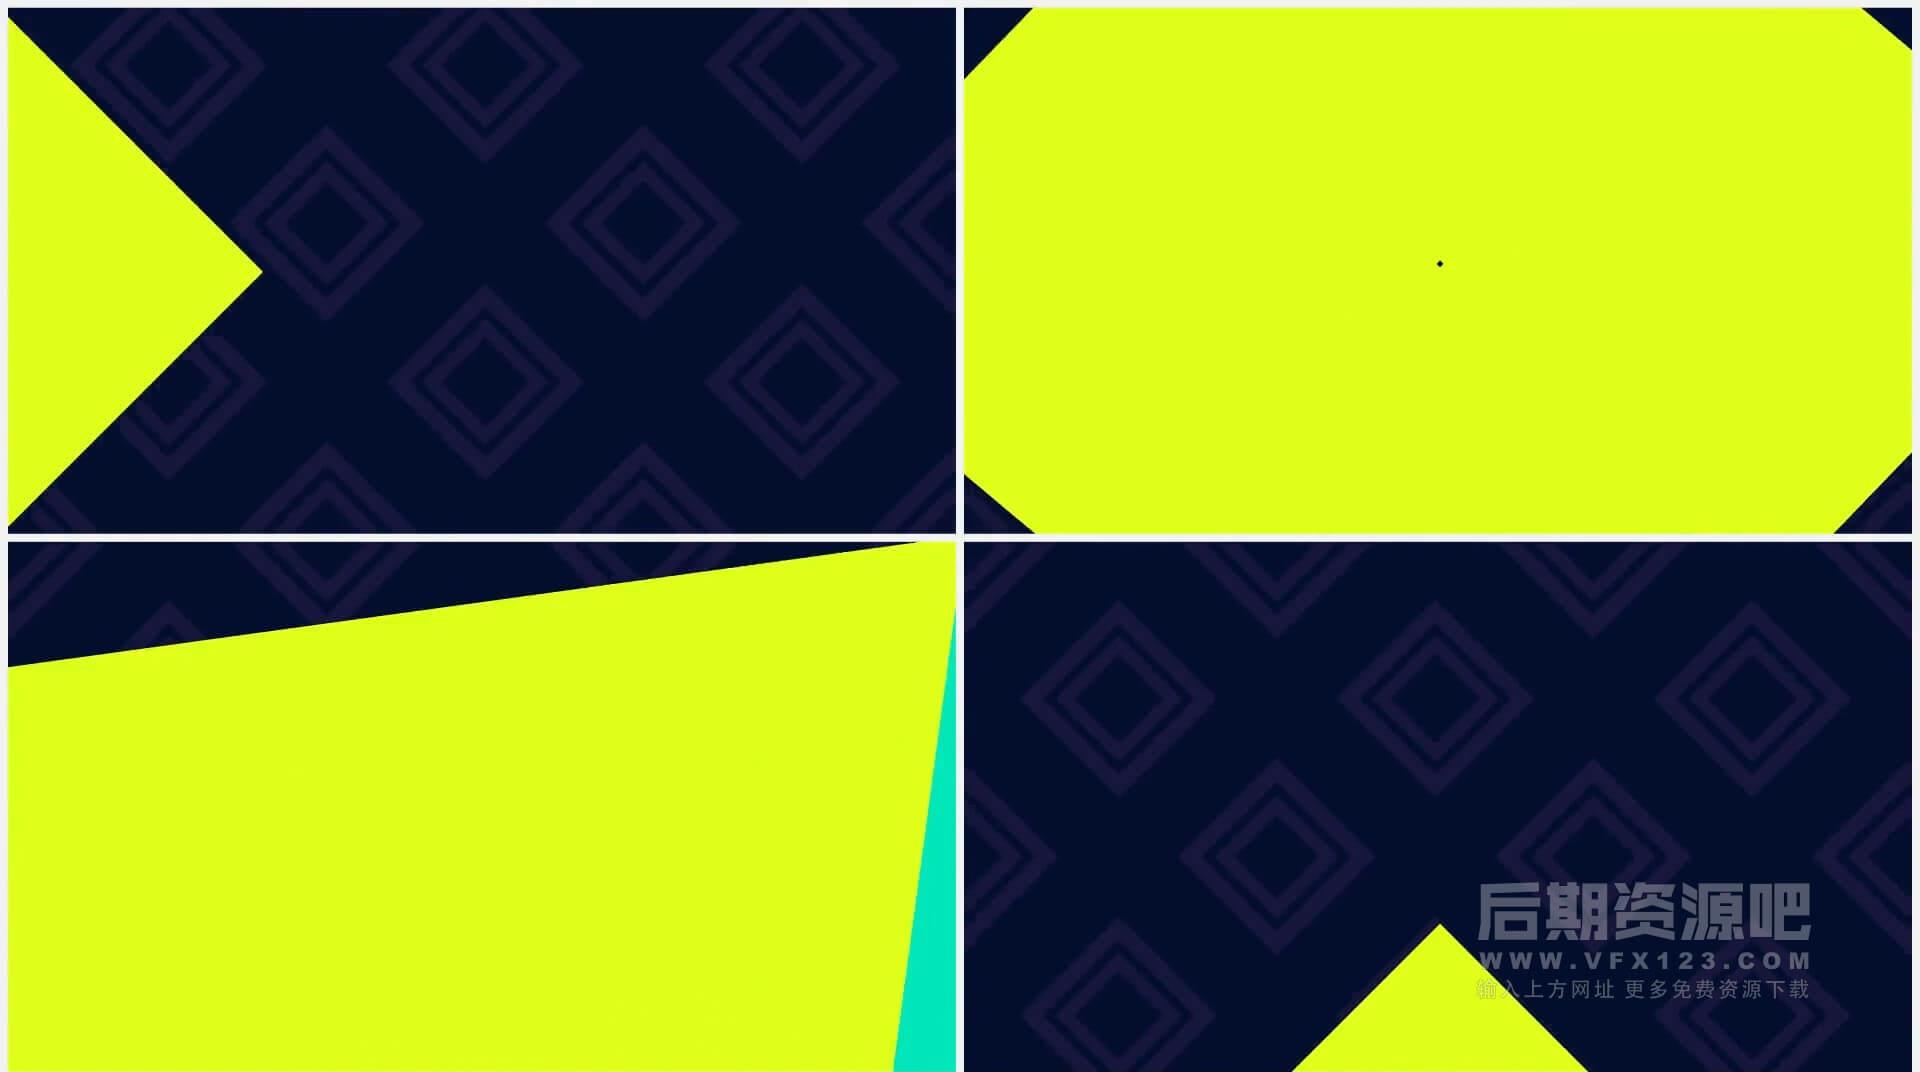 FCPX插件 运动图形排版动画标题场景片头转场 Motion Graphics Pack